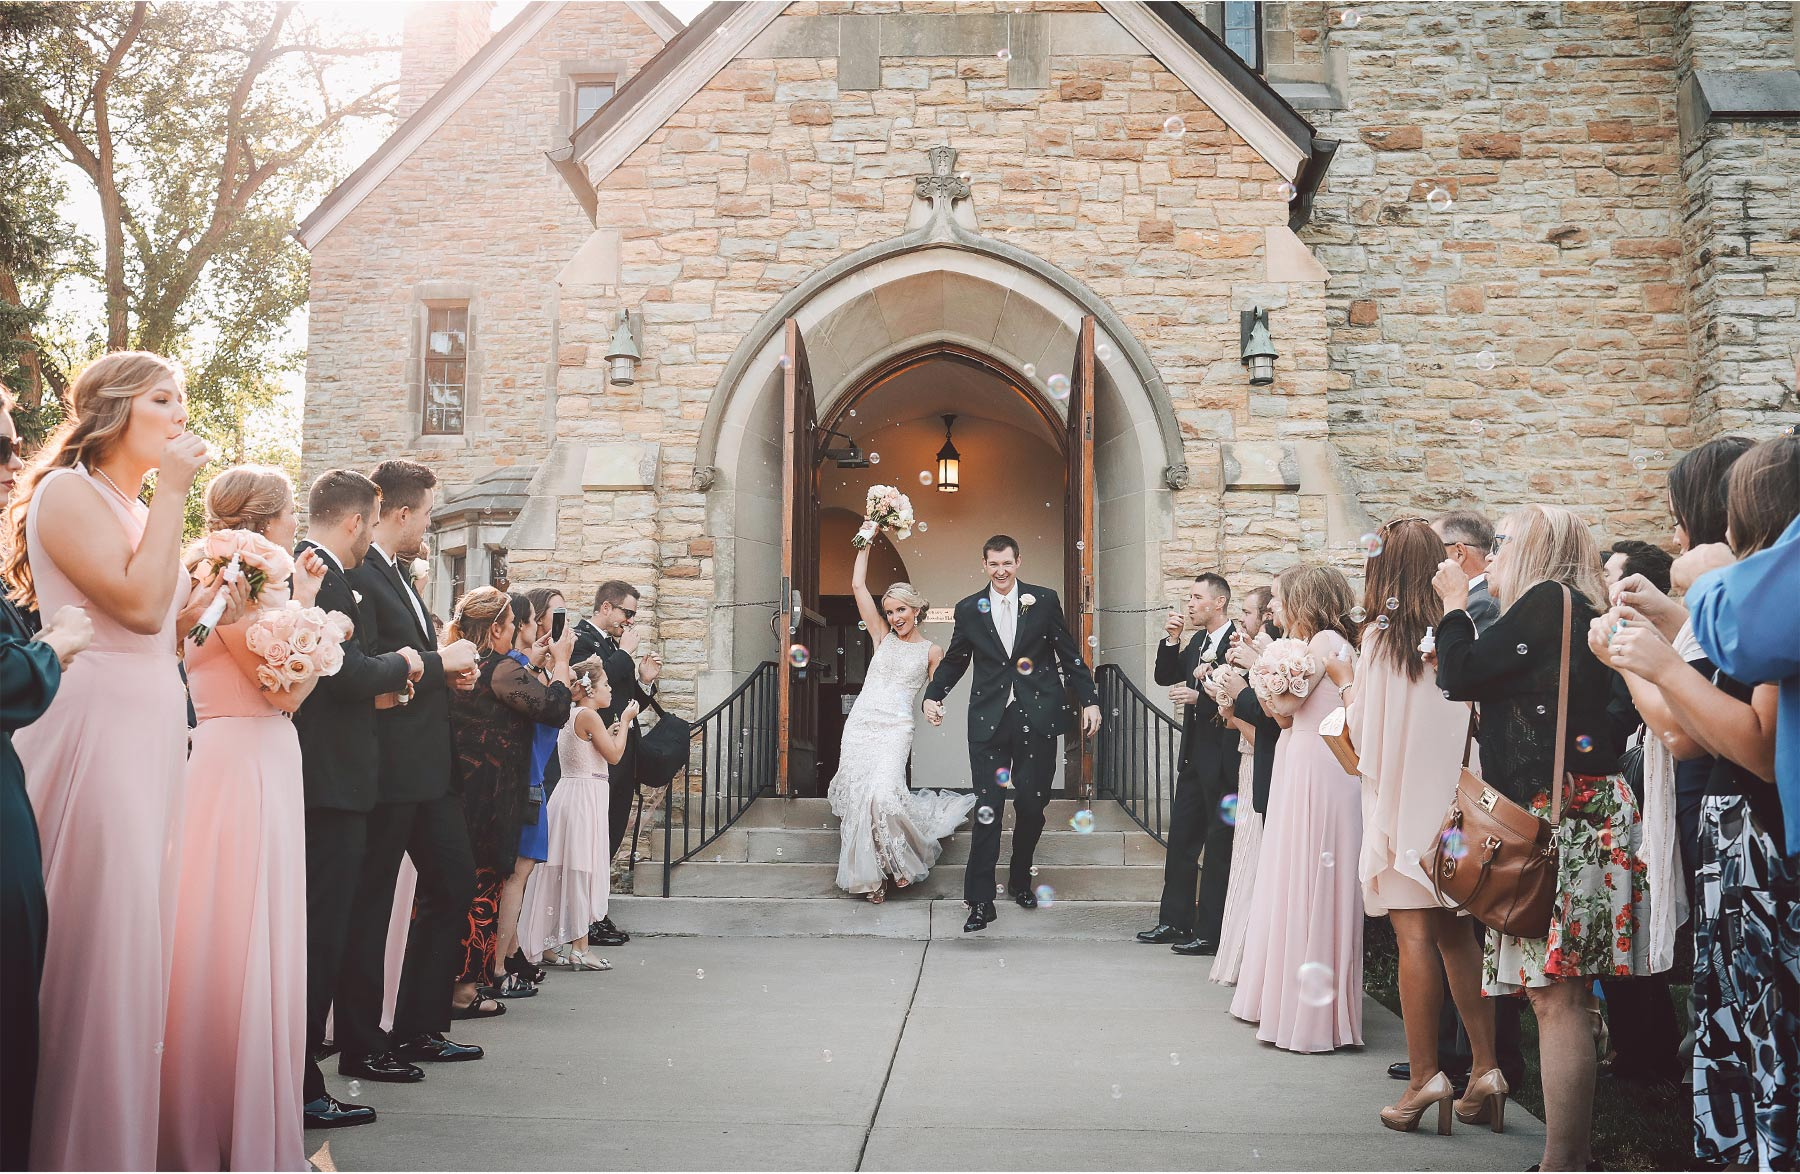 11-Minneapolis-Minnesota-Wedding-Photography-by-Vick-Photography-Ceremony-Lake-of-the-Isles-Lutheran-Church-Bubble-Send-Off-Jenna-and-Josh.jpg